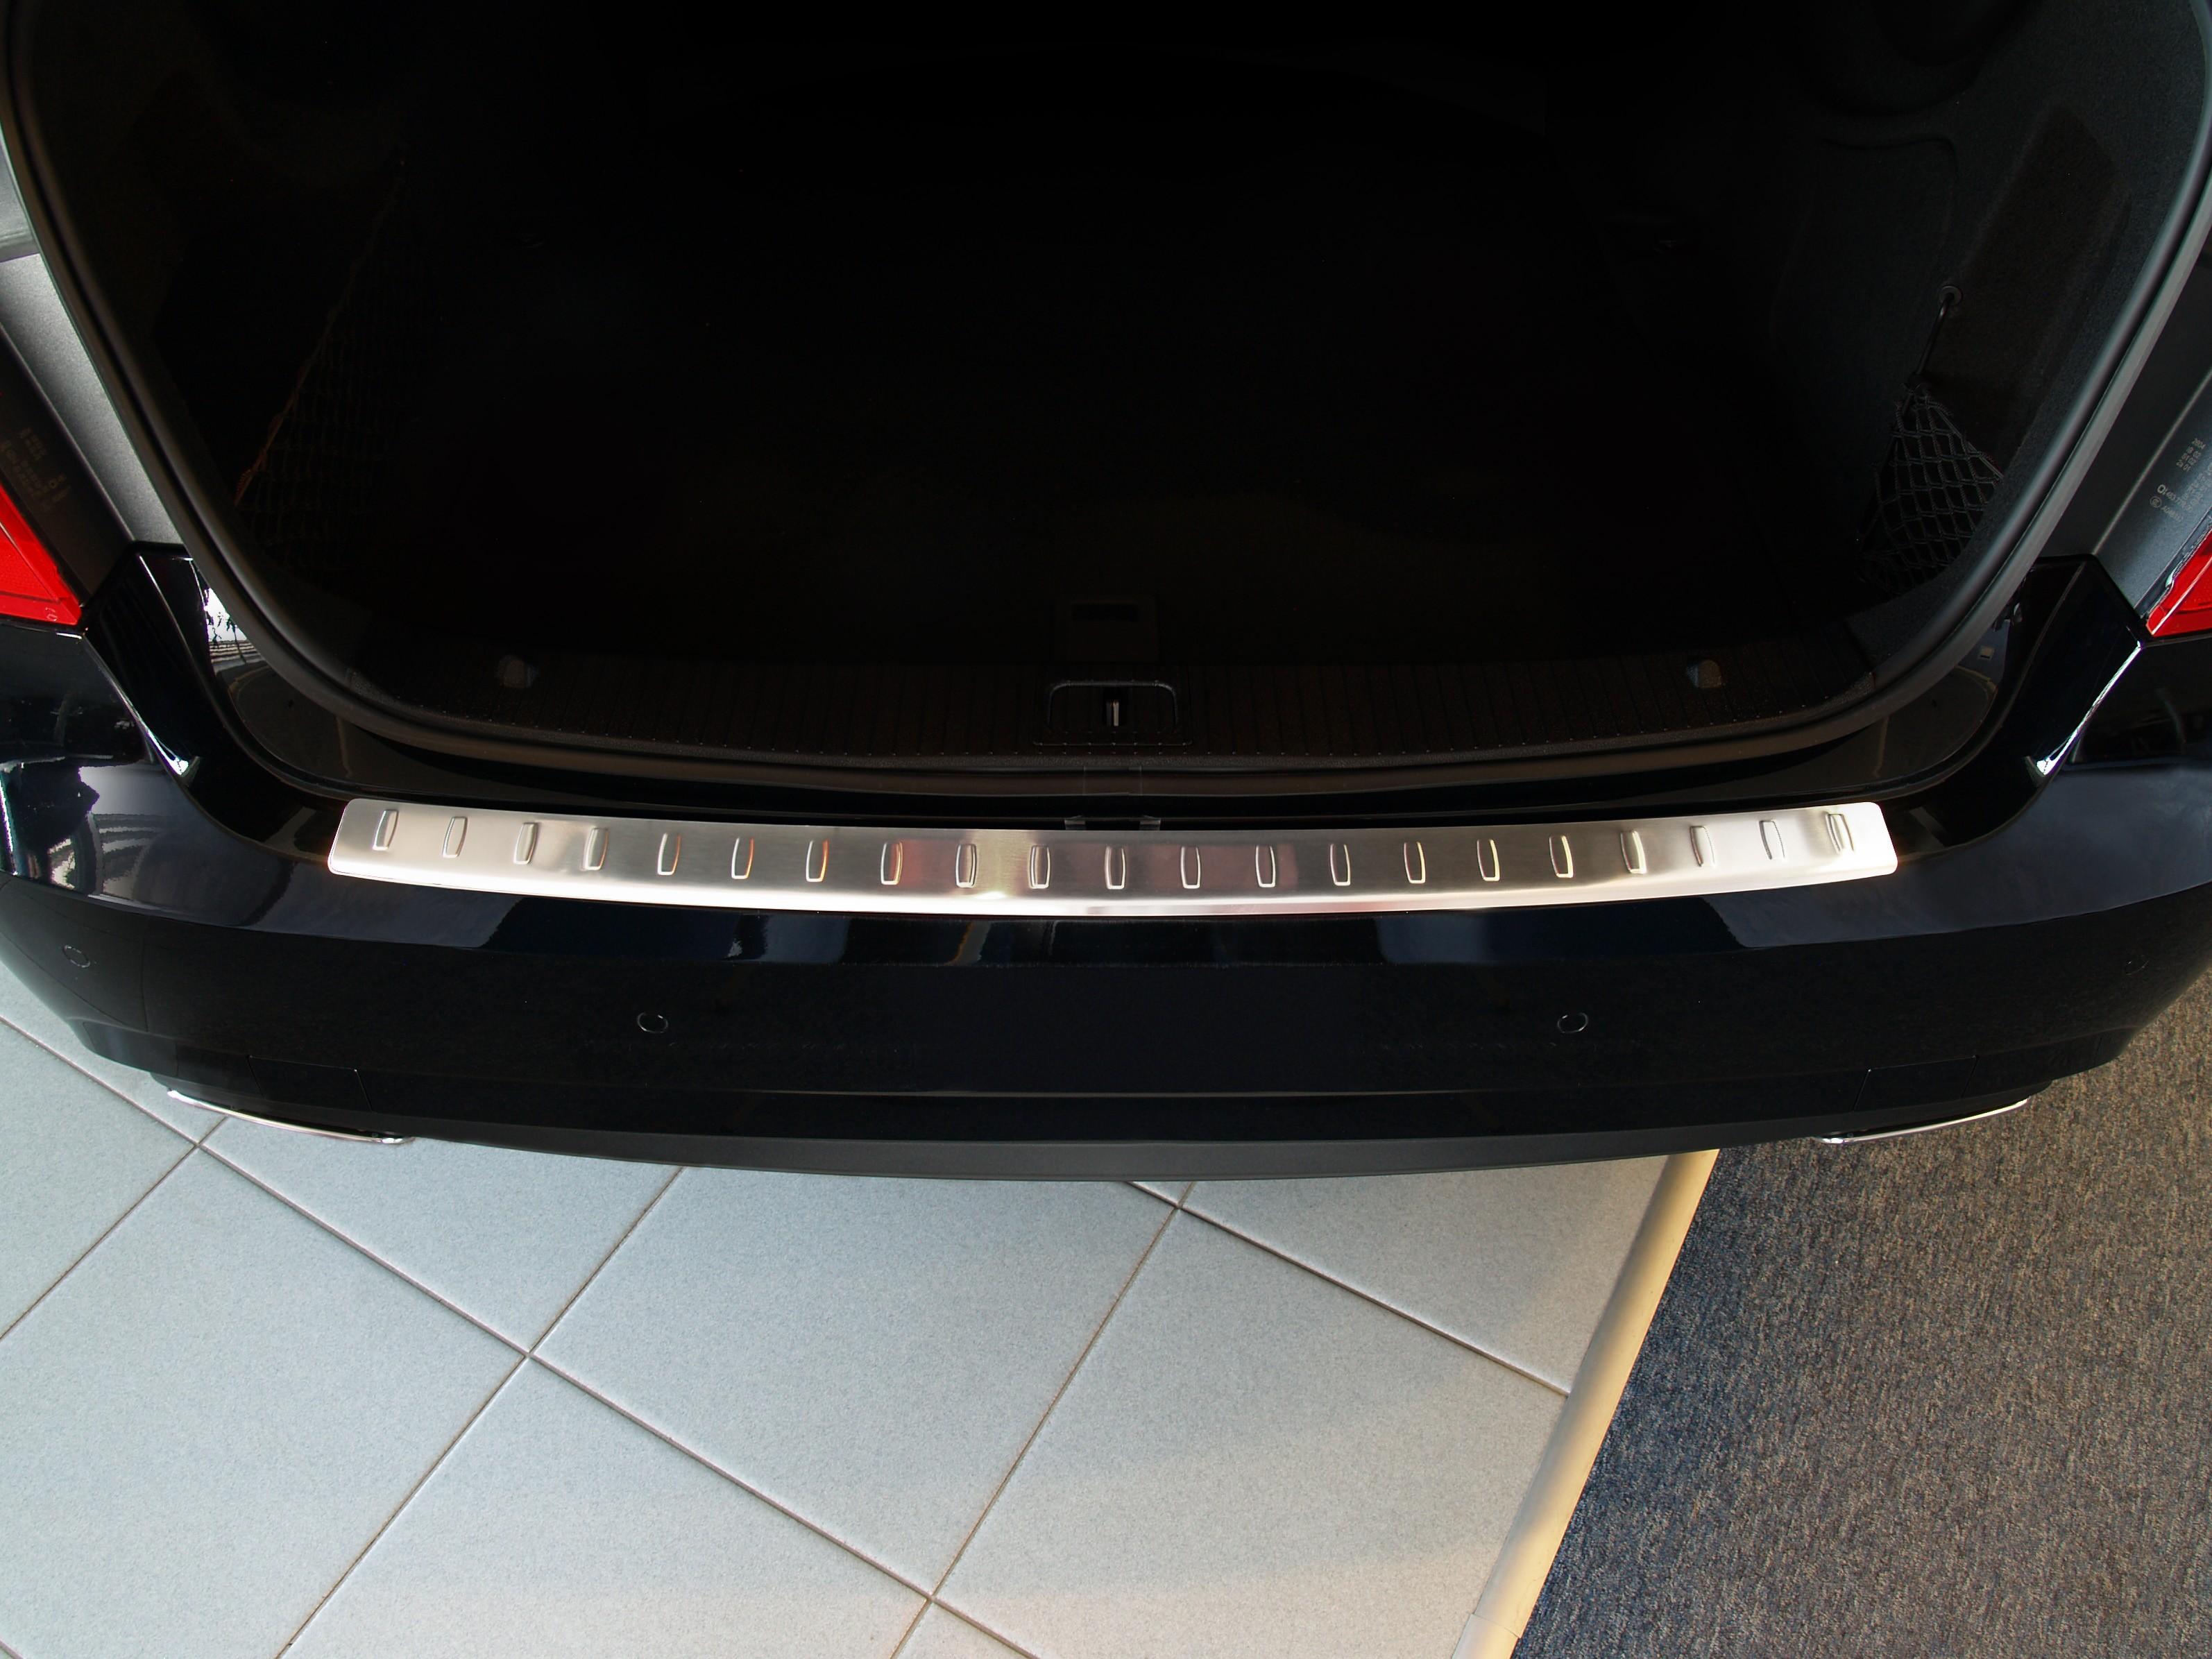 Mercedes E Class W212 Limousine profiledribs 2009-